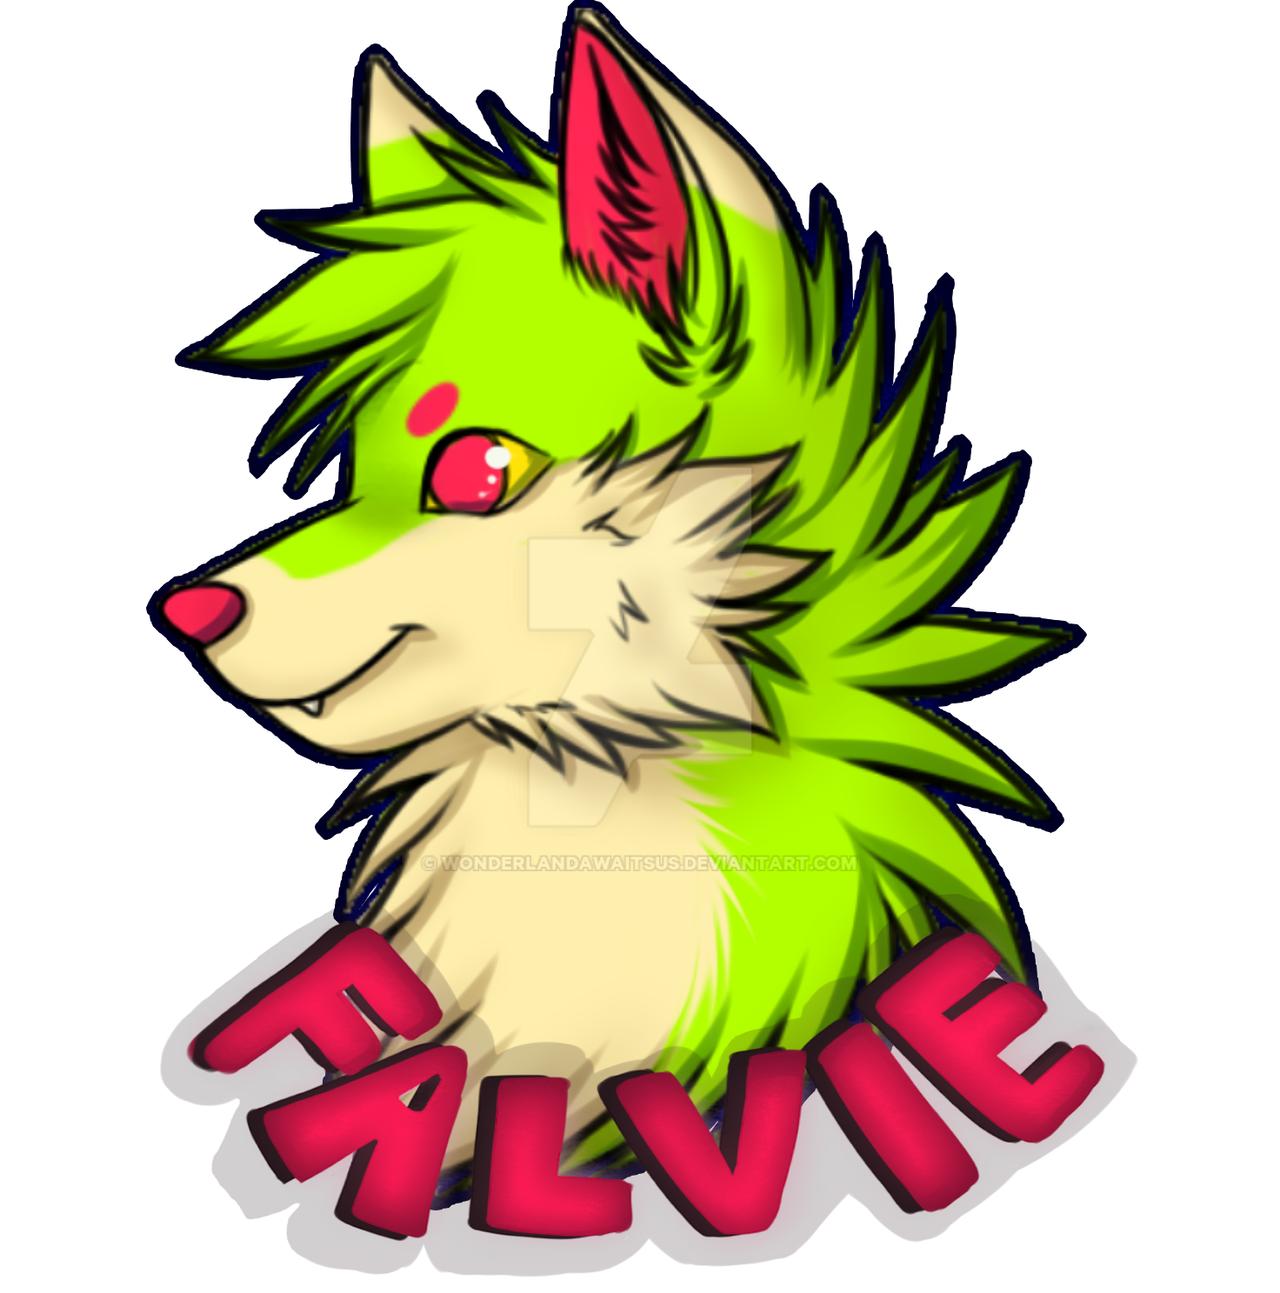 Falvie Bust Badge by Wonderlandawaitsus